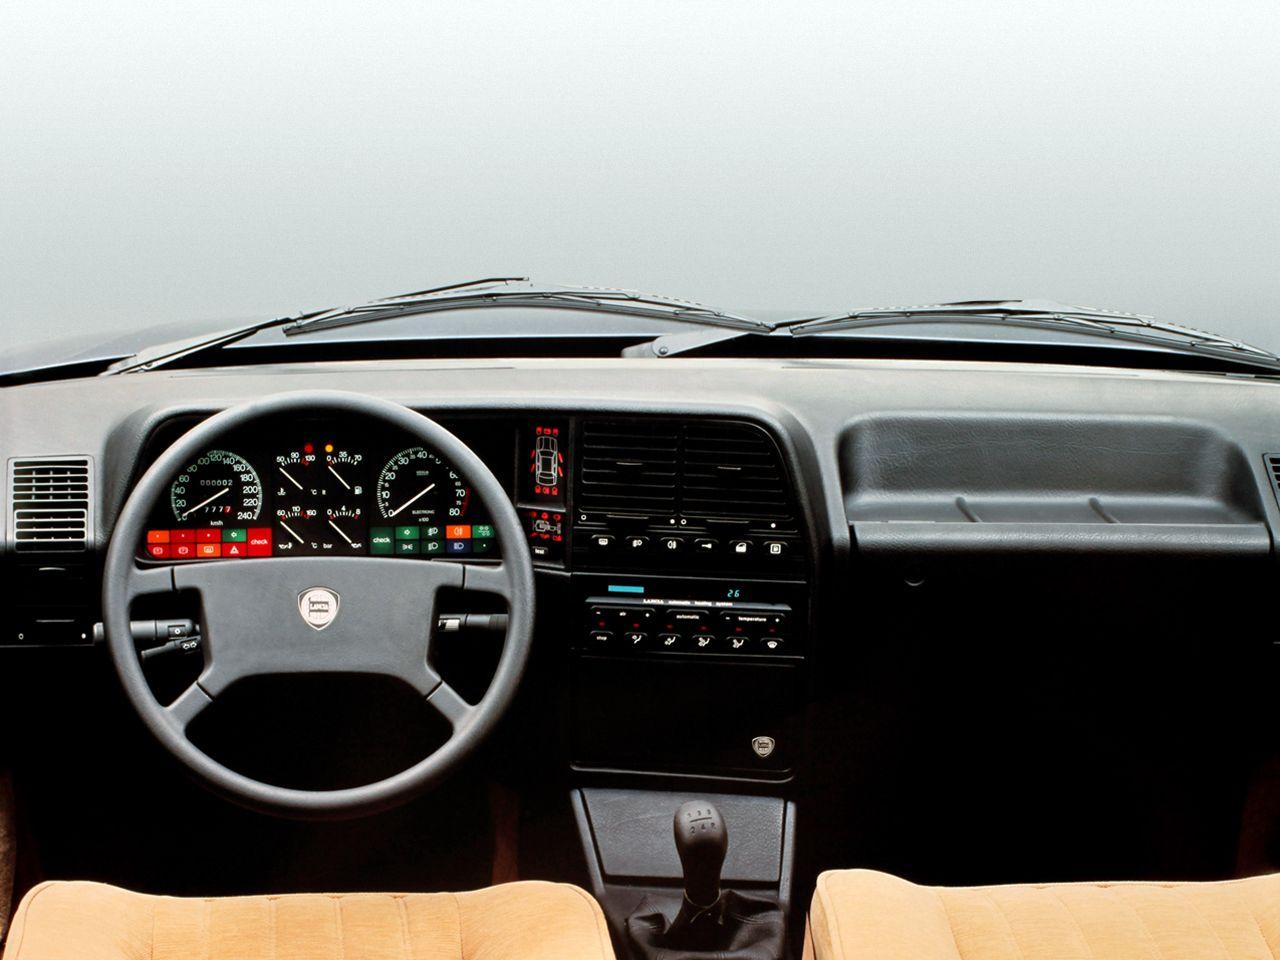 1984 Lancia Thema 6V | Lancia | Pinterest | Cars, Car interiors and ...